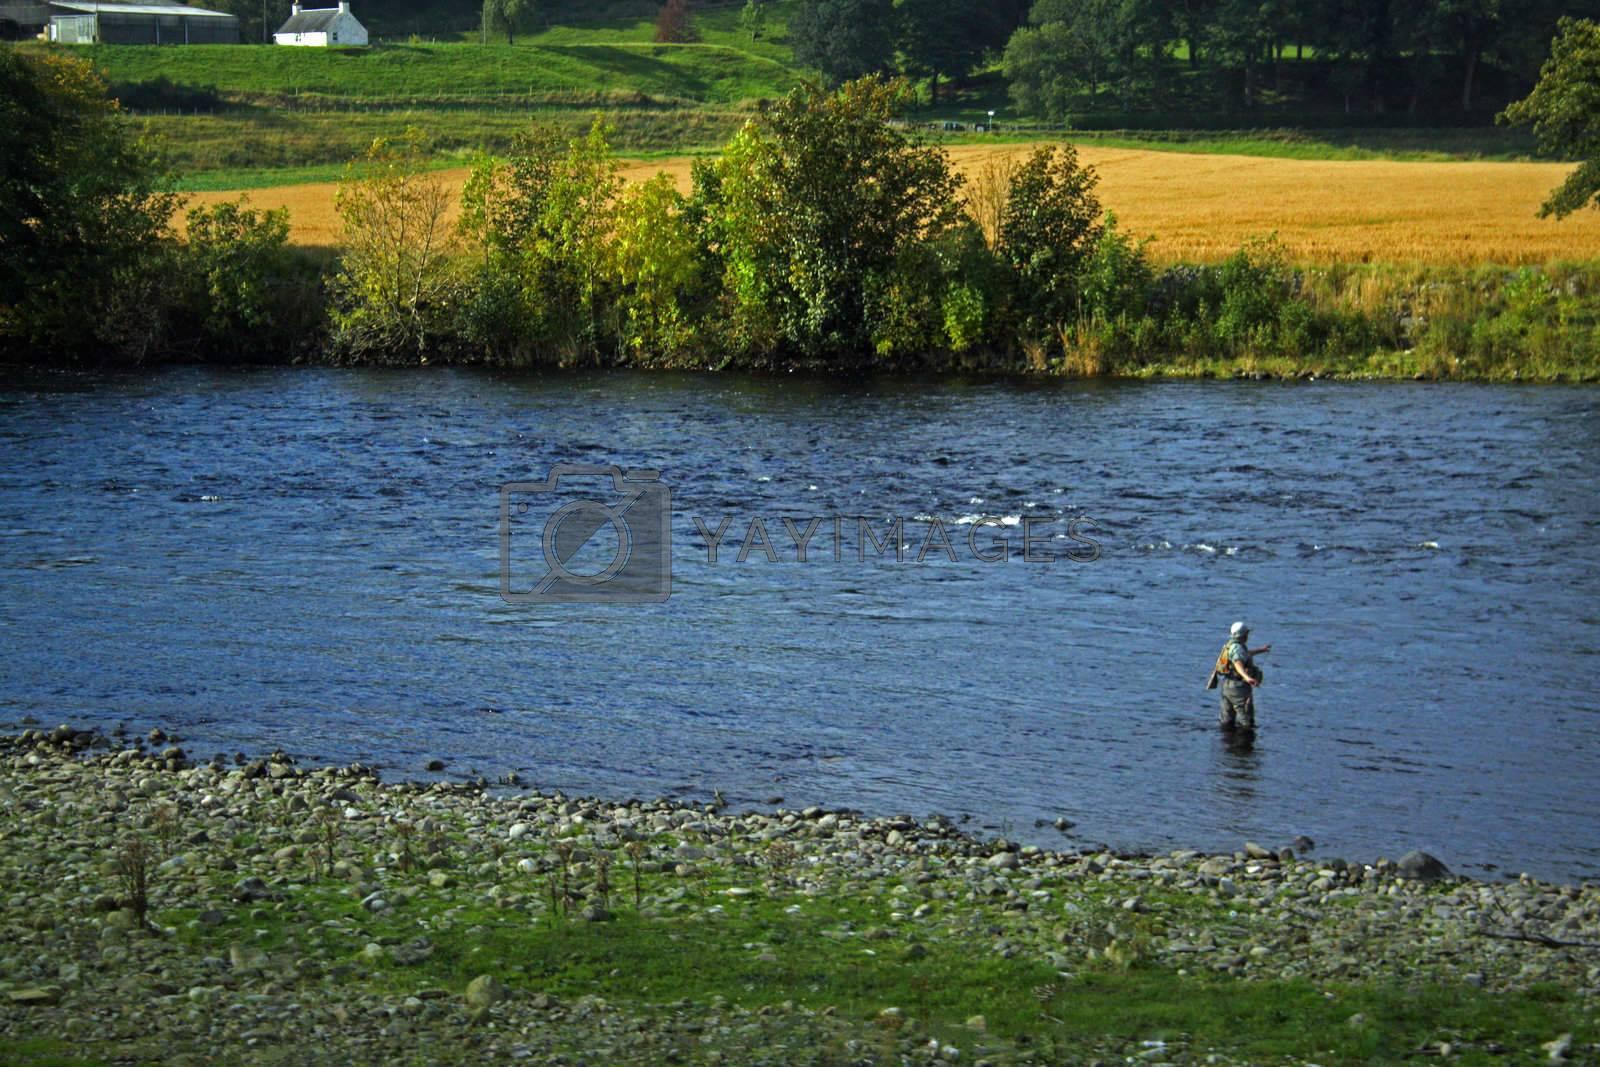 Fisherman angling waist deep in a stream in Scottland